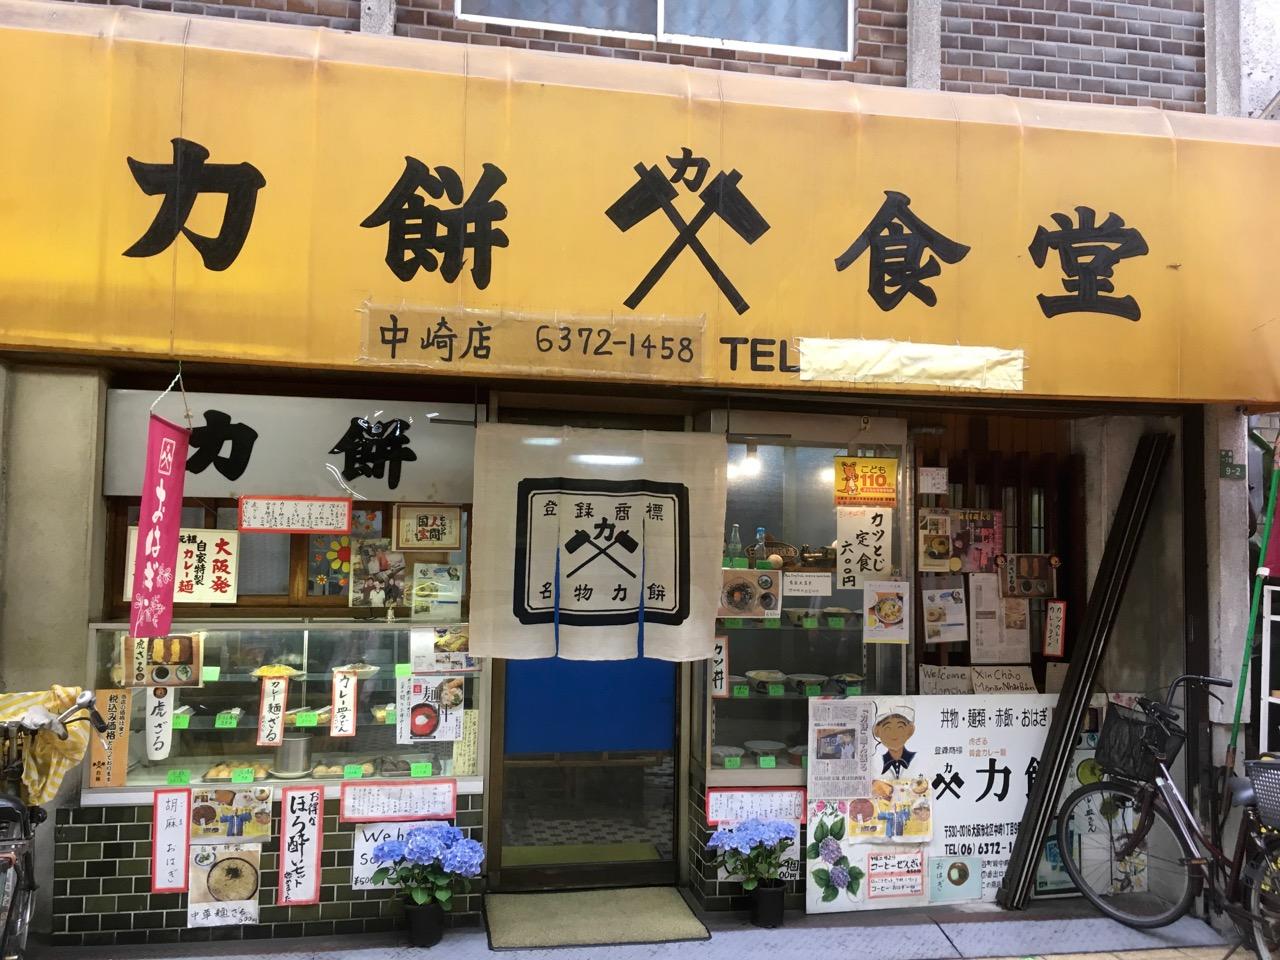 Chikaramochi in Nakazakicyo/ 中崎町の力餅食堂